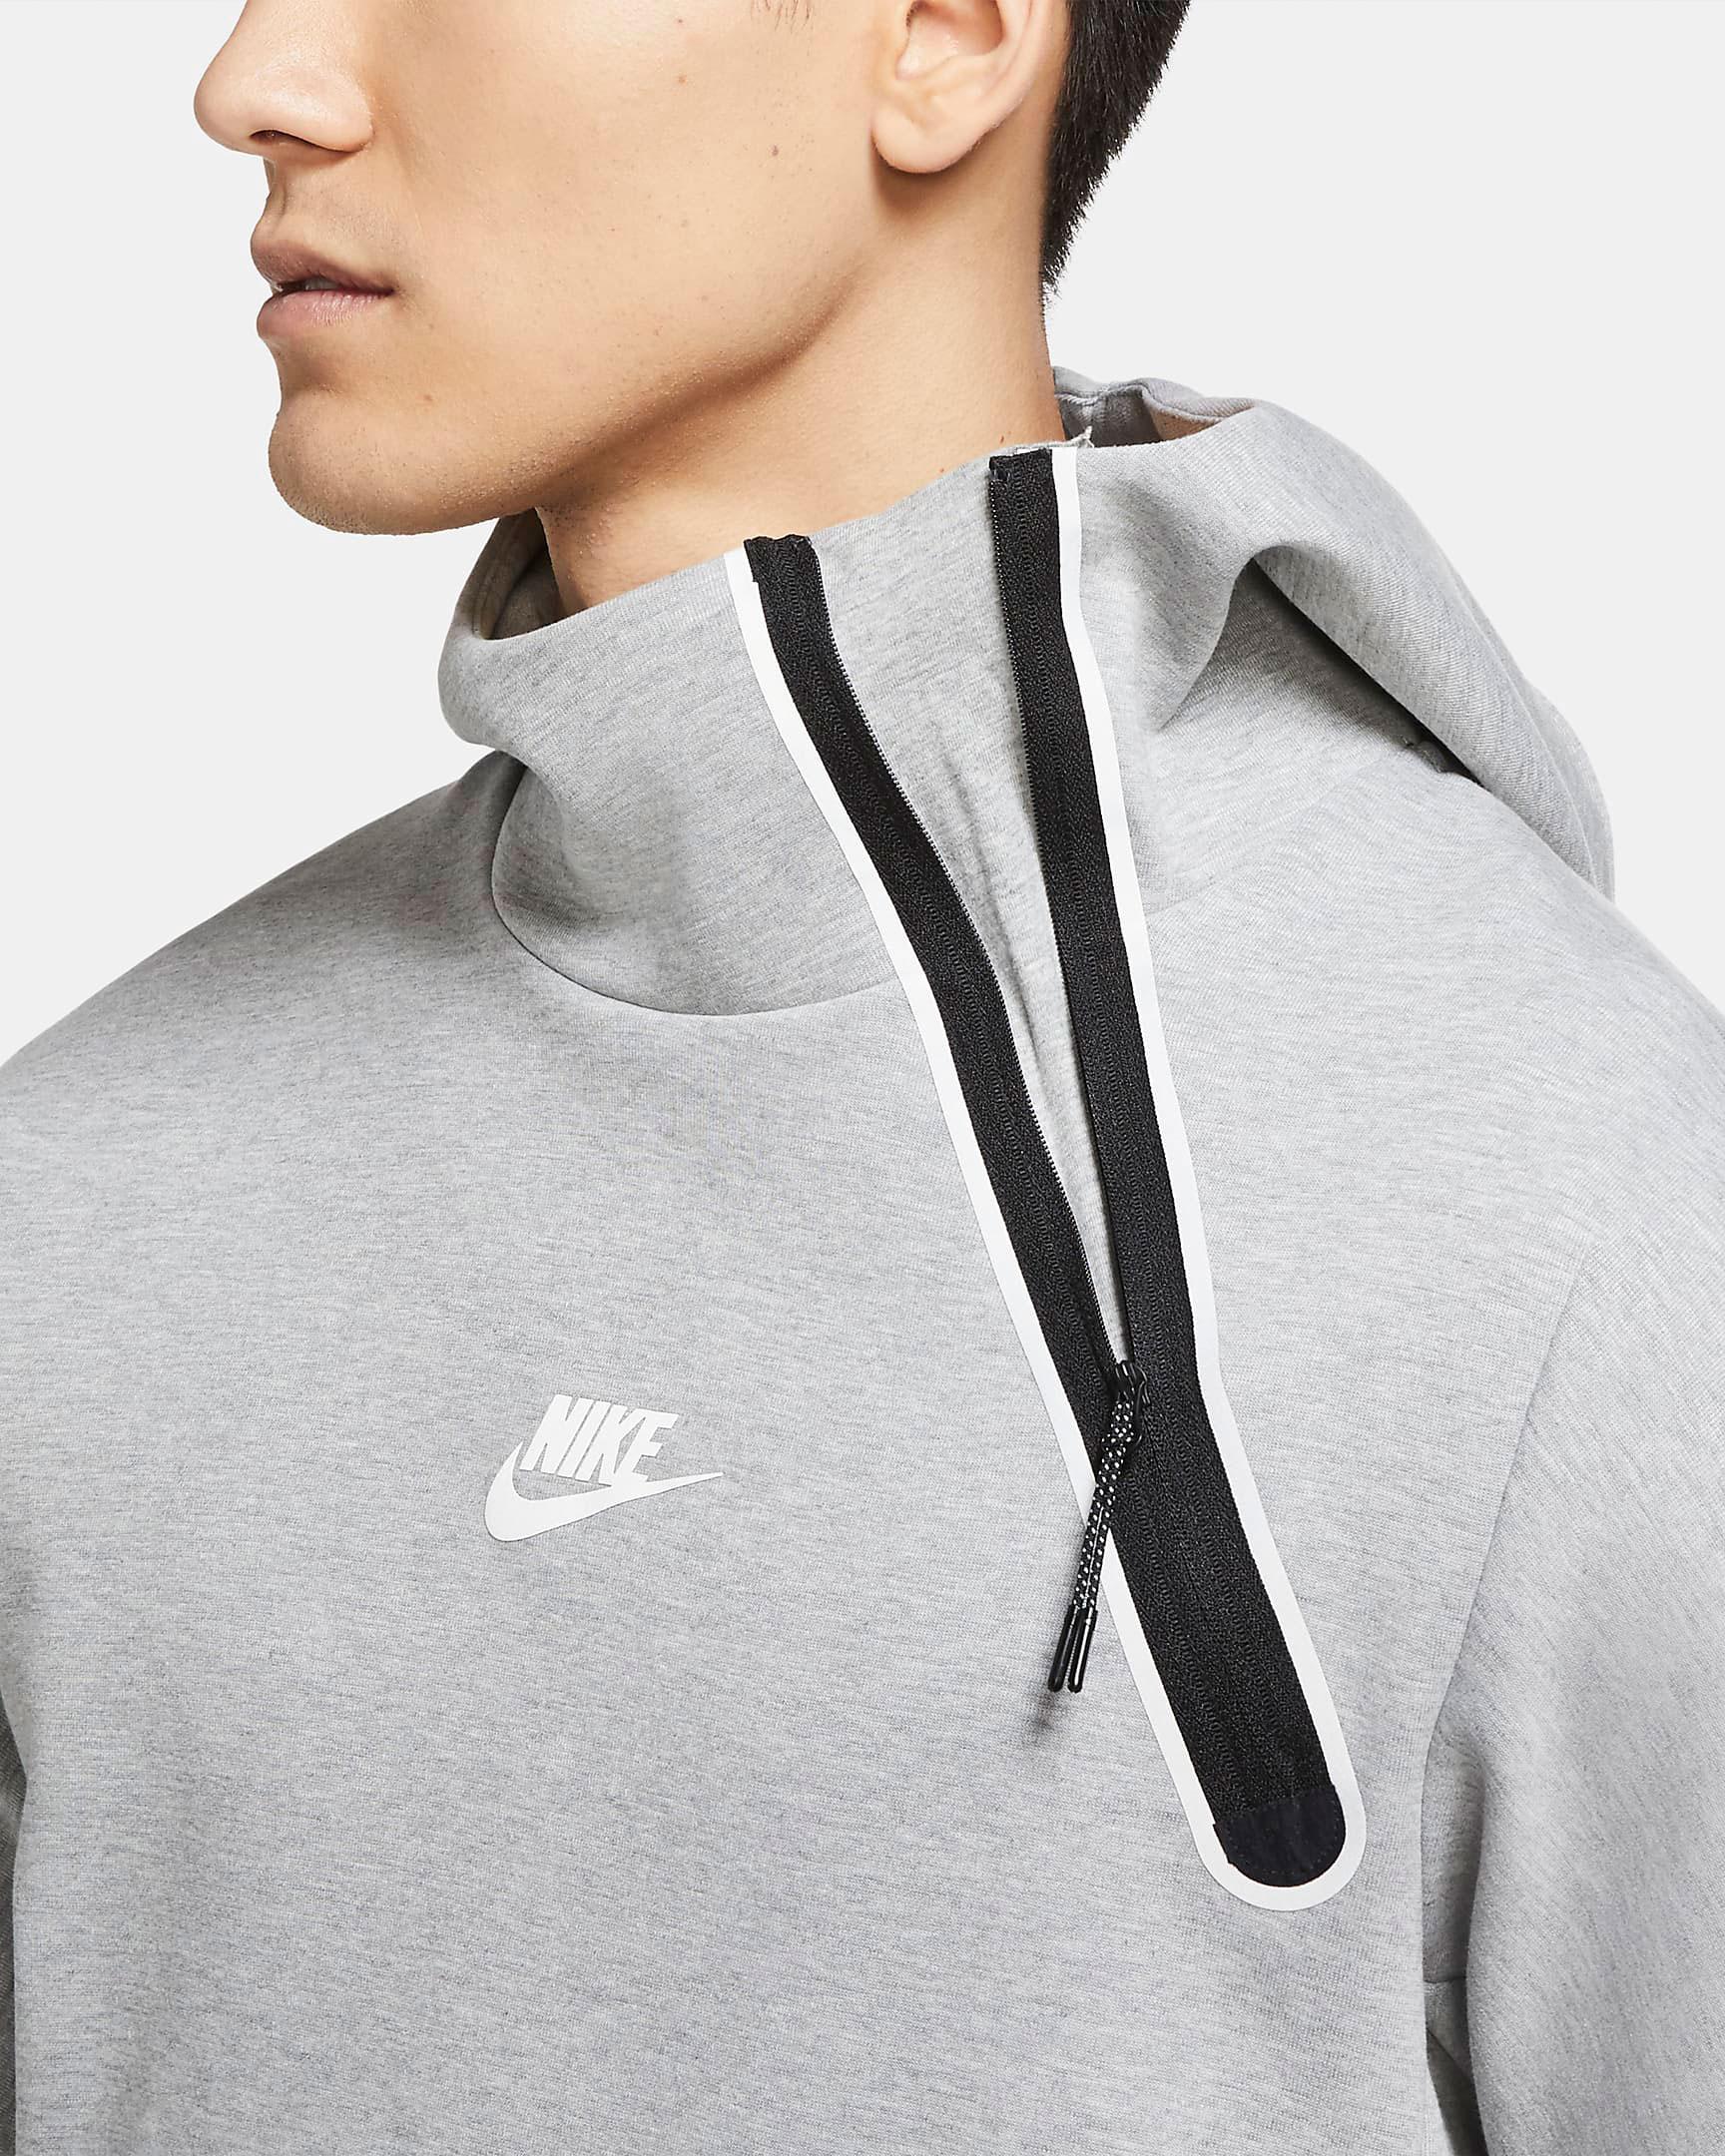 nike-air-max-95-neon-volt-grey-tech-fleece-hoodie-3